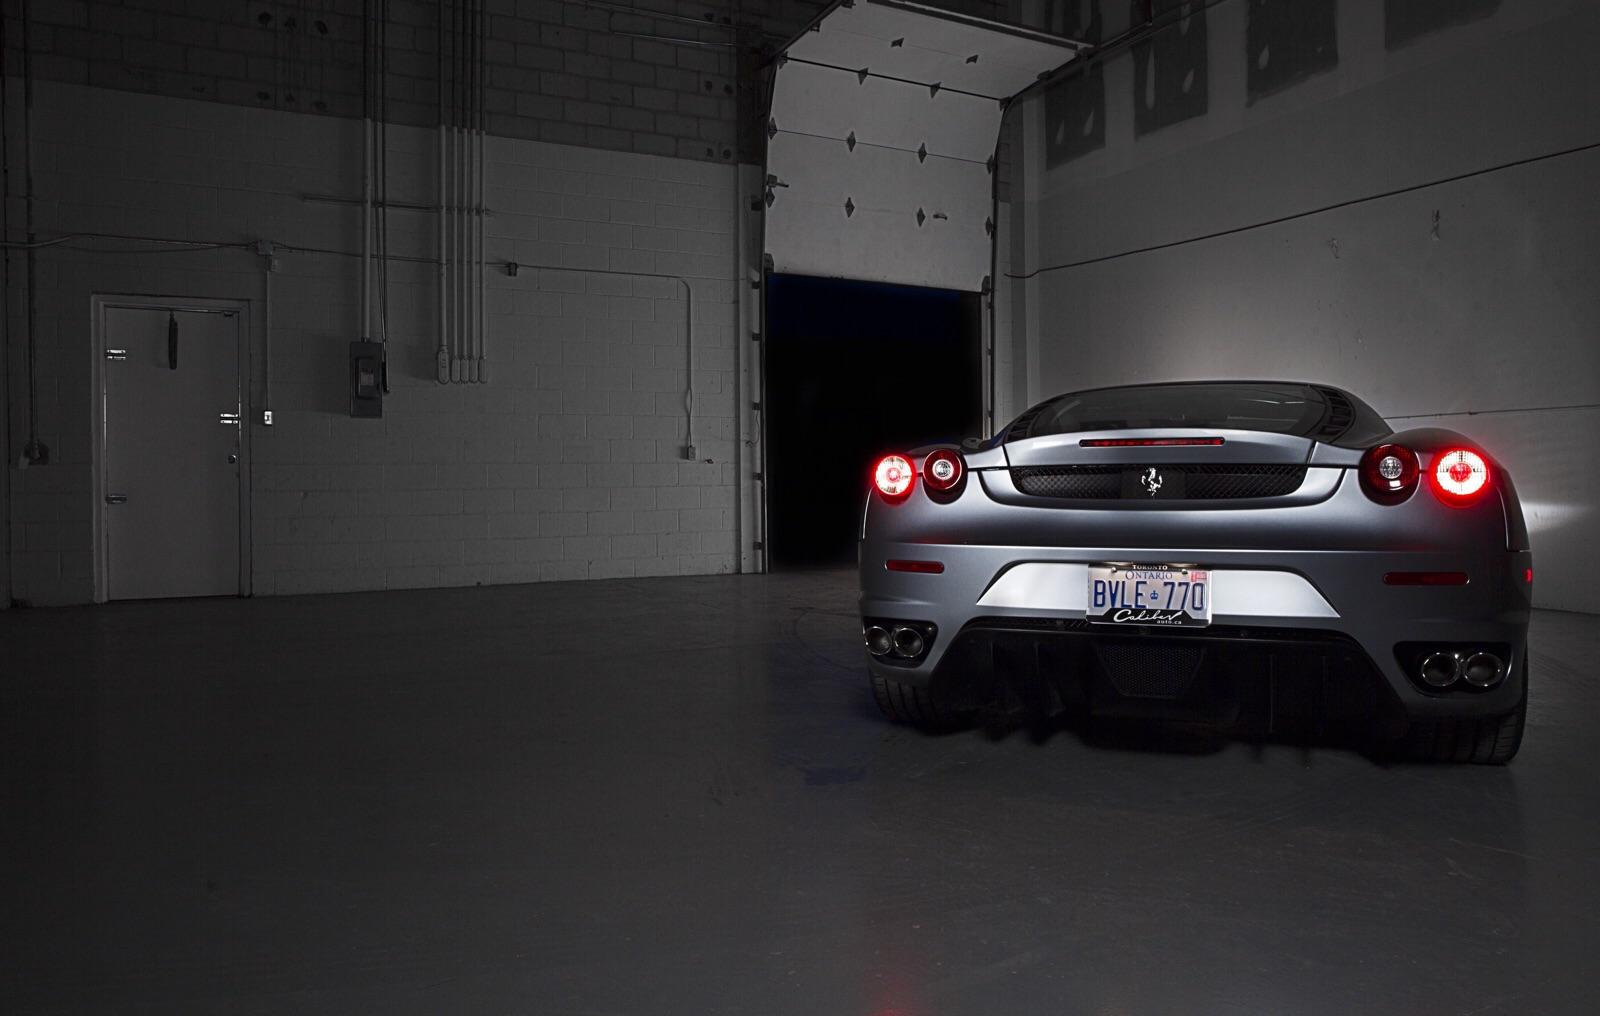 Living With The Ferrari F430 Lamborghini Mustang Edition